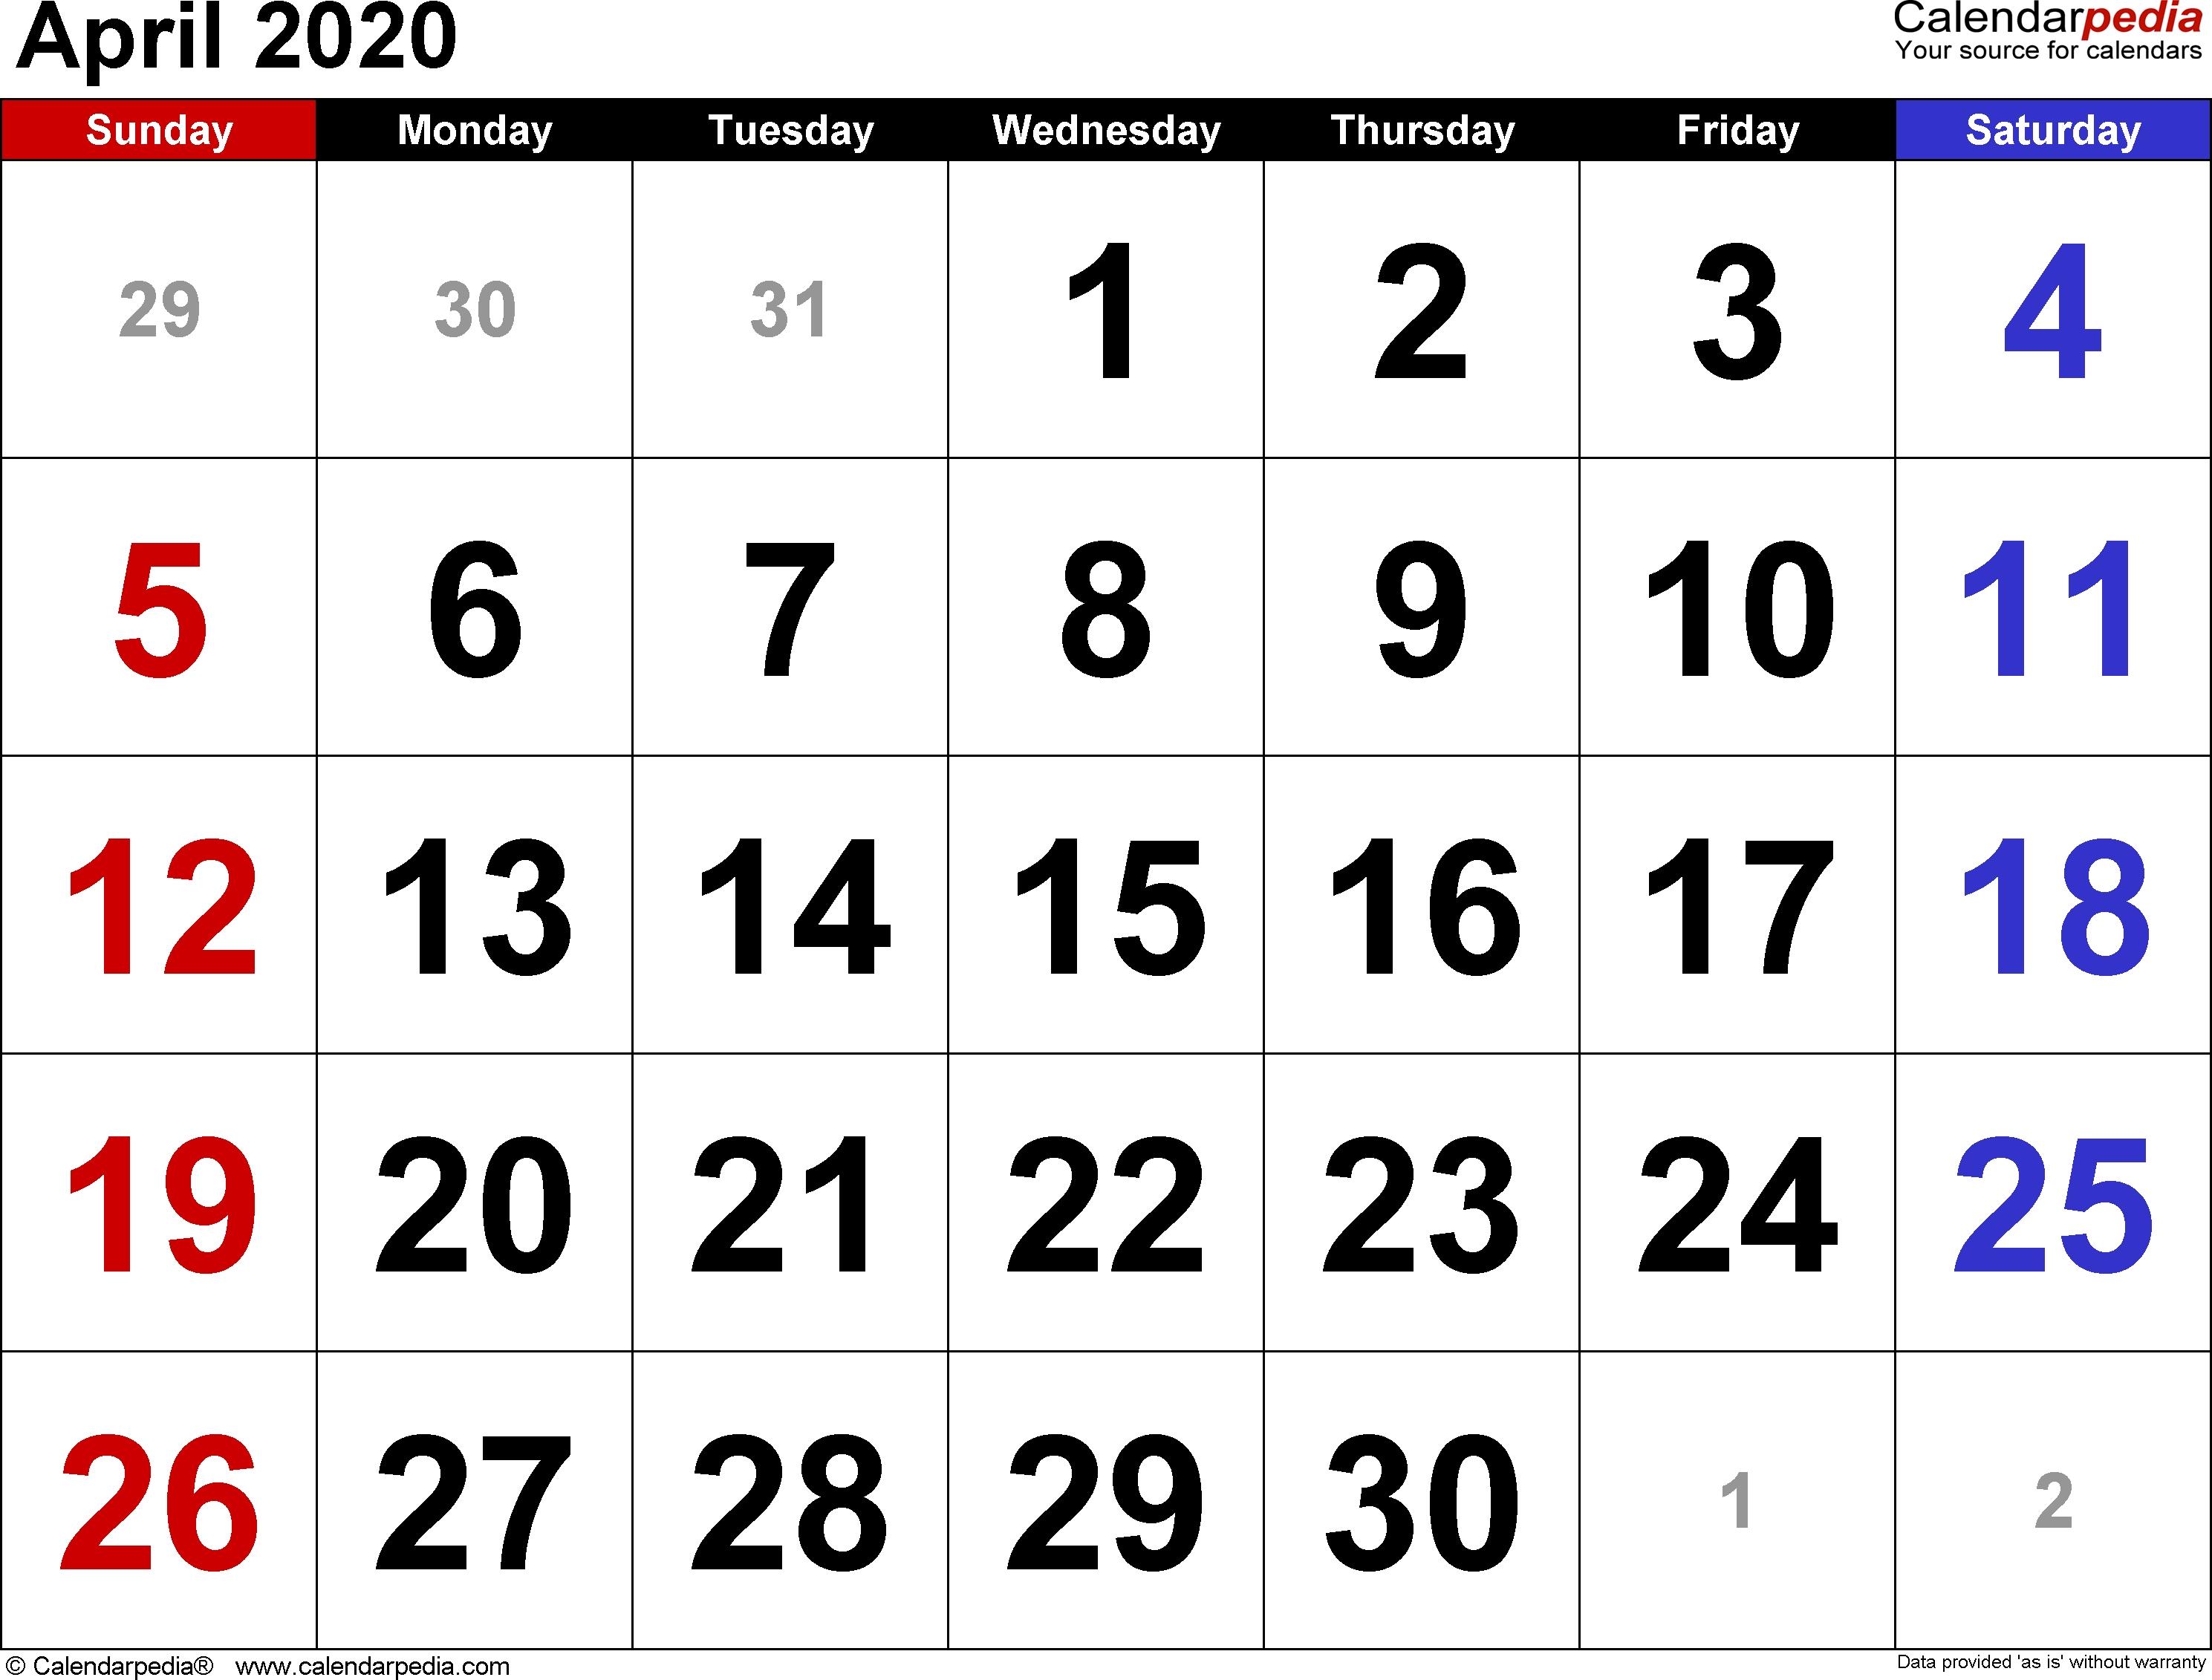 April 2020 Calendars For Word, Excel & Pdf